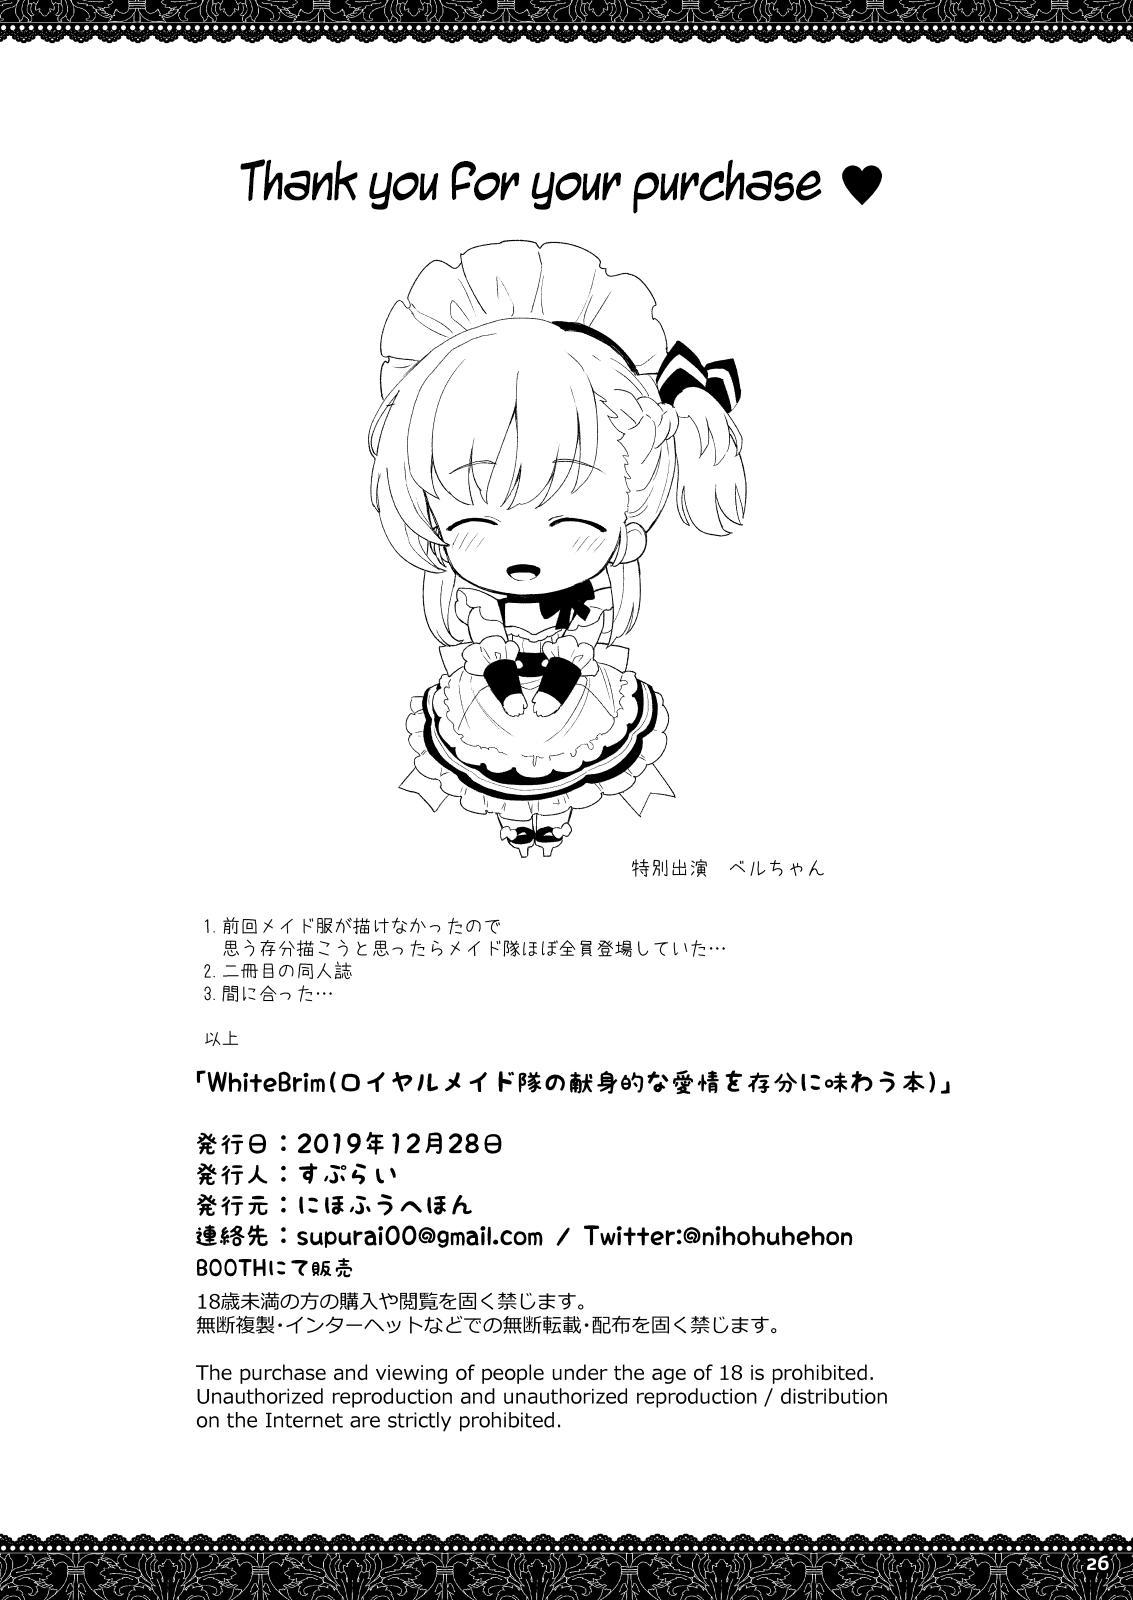 [Nihohuhehon (Supurai)] WhiteBrim Royal Maid-tai no Kenshin-Tekina Aijou o Zonbun ni Ajiwau Hon | WhiteBrim: An Appreciation Book to The Devoted Love of Royal Maid Corp (Azur Lane) [English] [Night Revenants] [Digital] 24